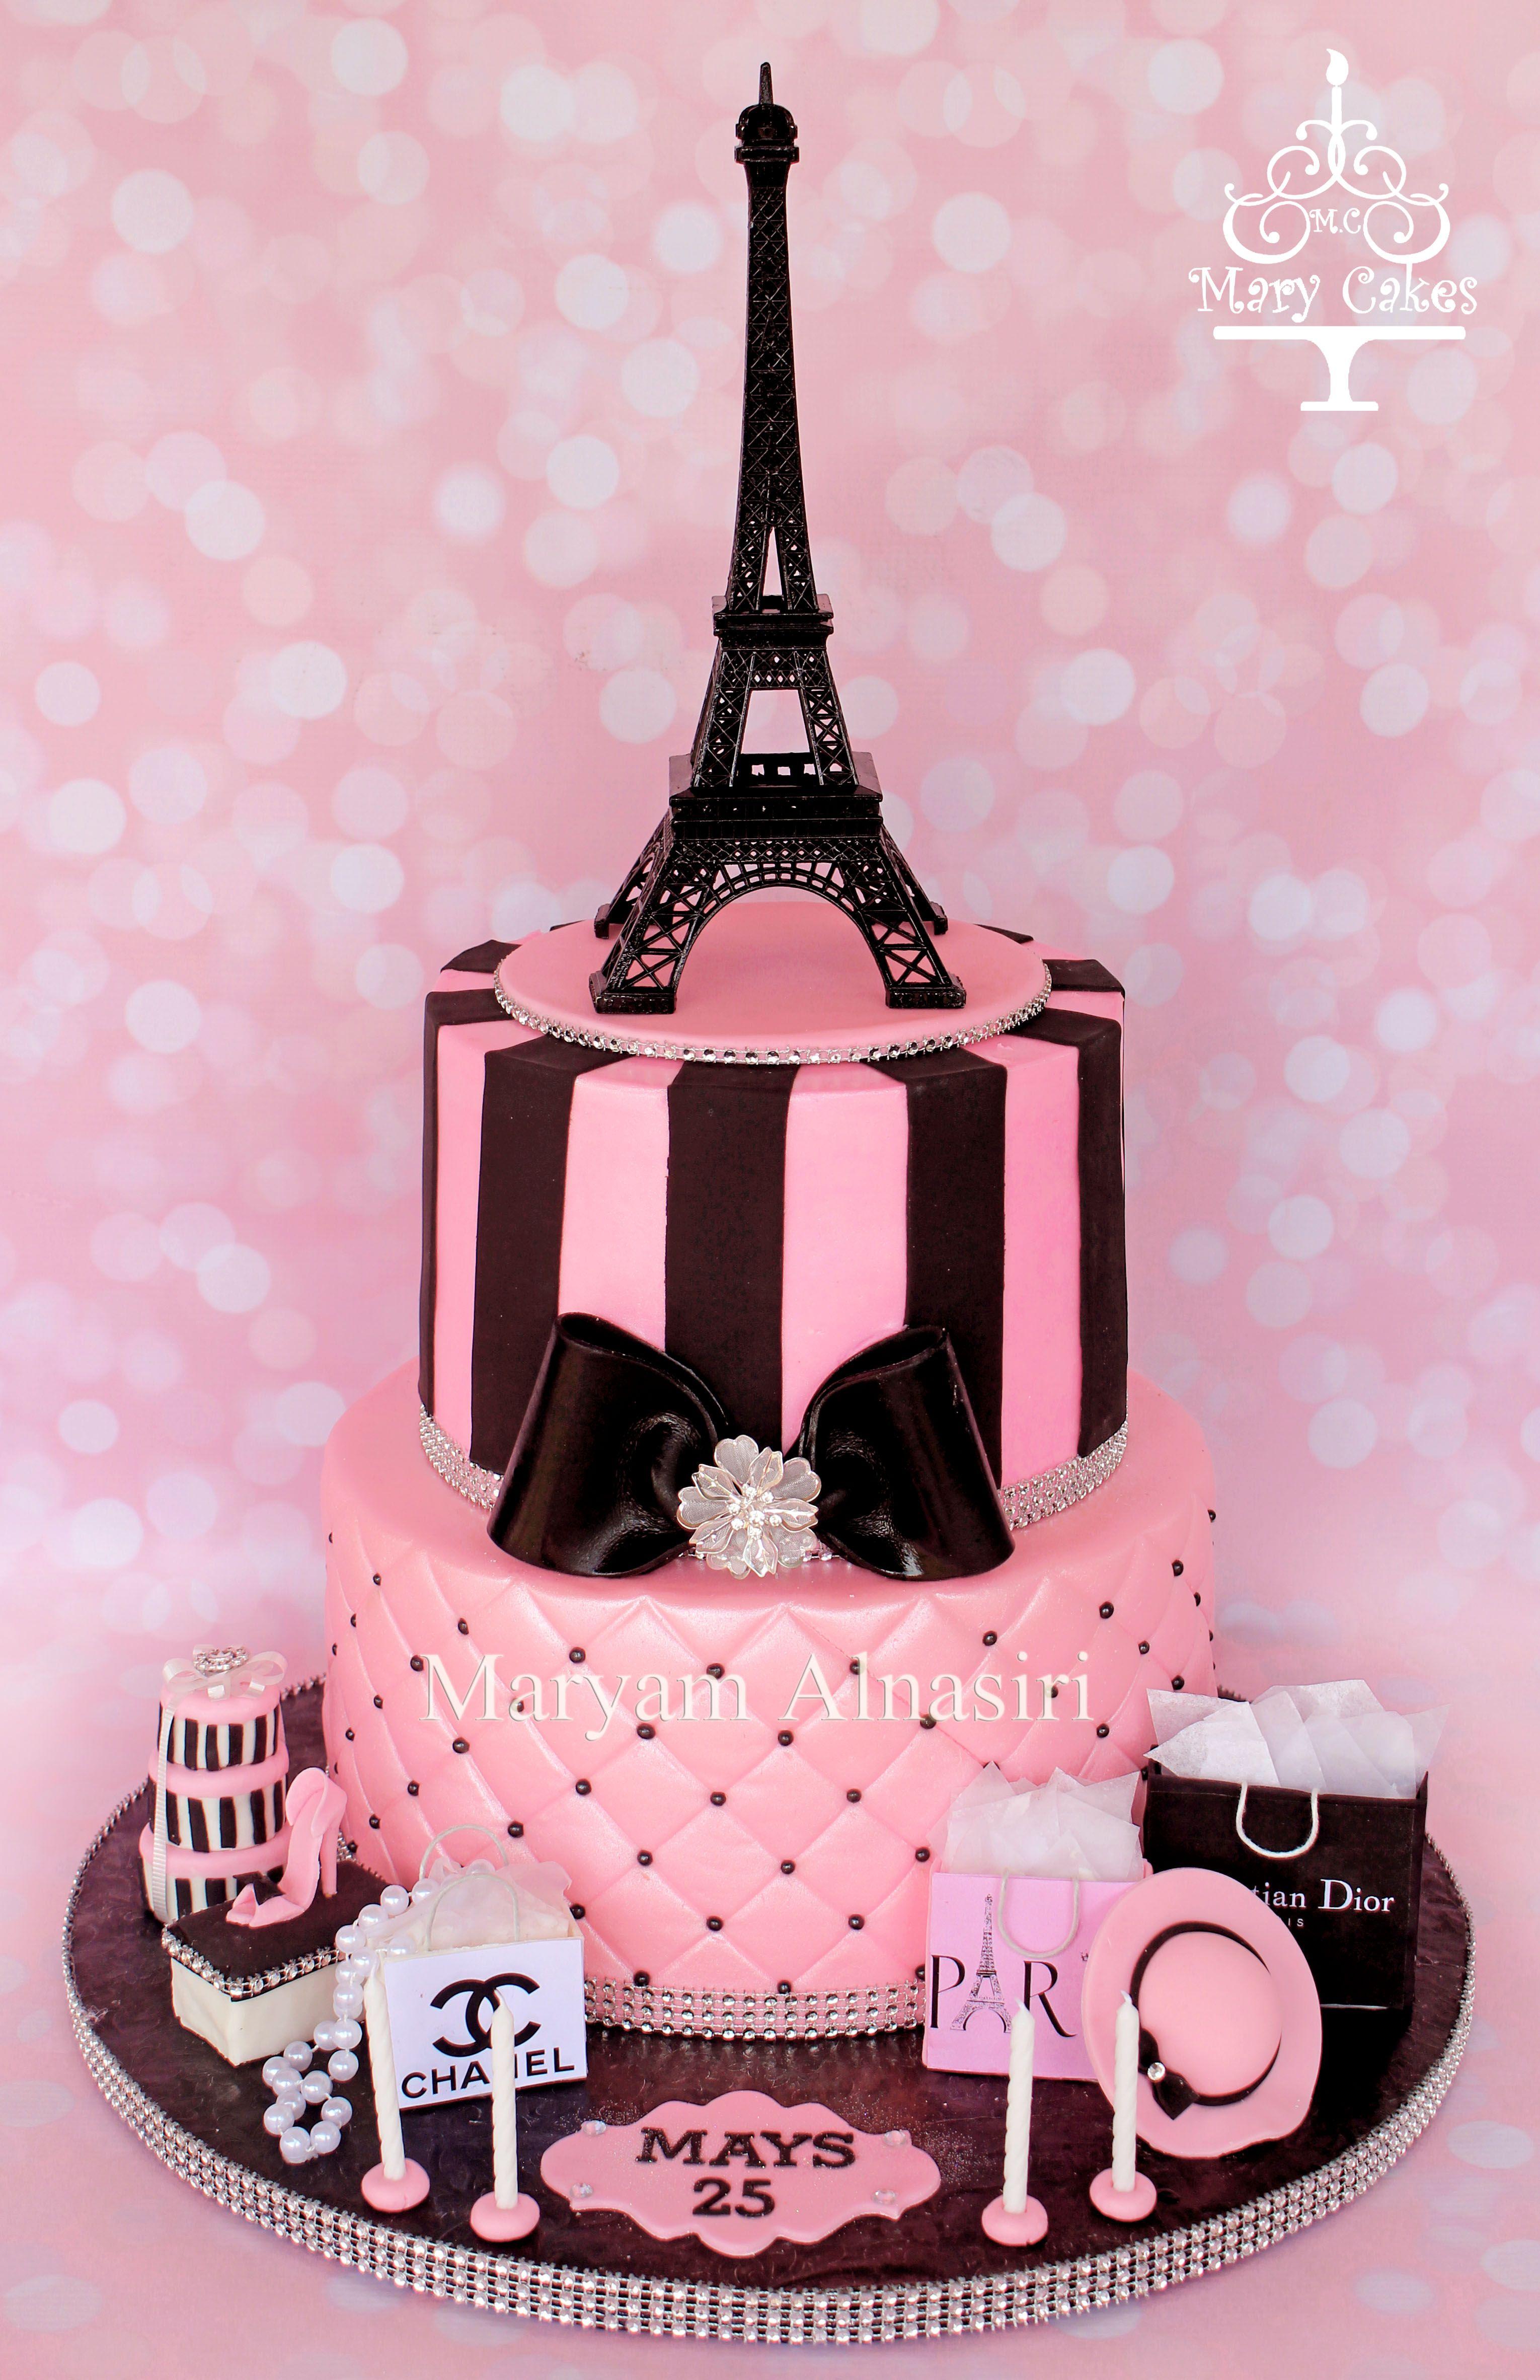 Astonishing Parisian Theme Cake Pariscake Eiffeltower Pinkandblack Paris Funny Birthday Cards Online Alyptdamsfinfo